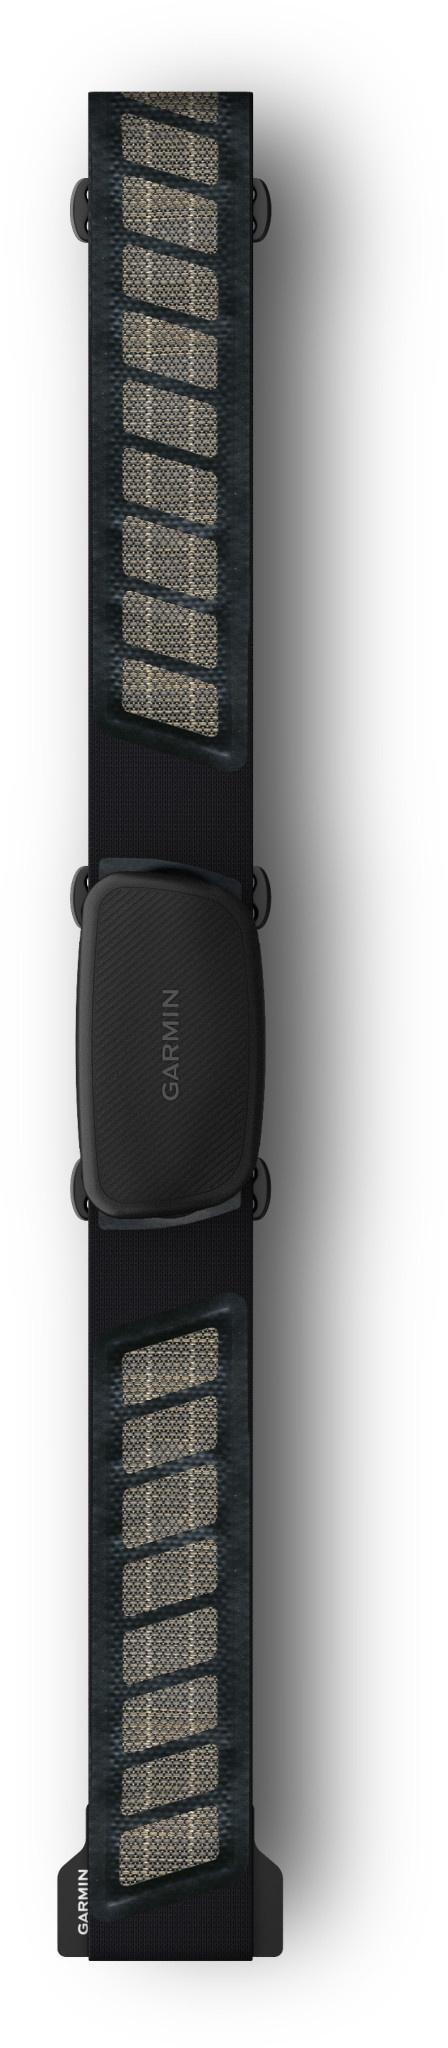 Garmin Garmin HRM Dual heart rate transmitter - ANT+ and Bluetooth (NEW 2019)